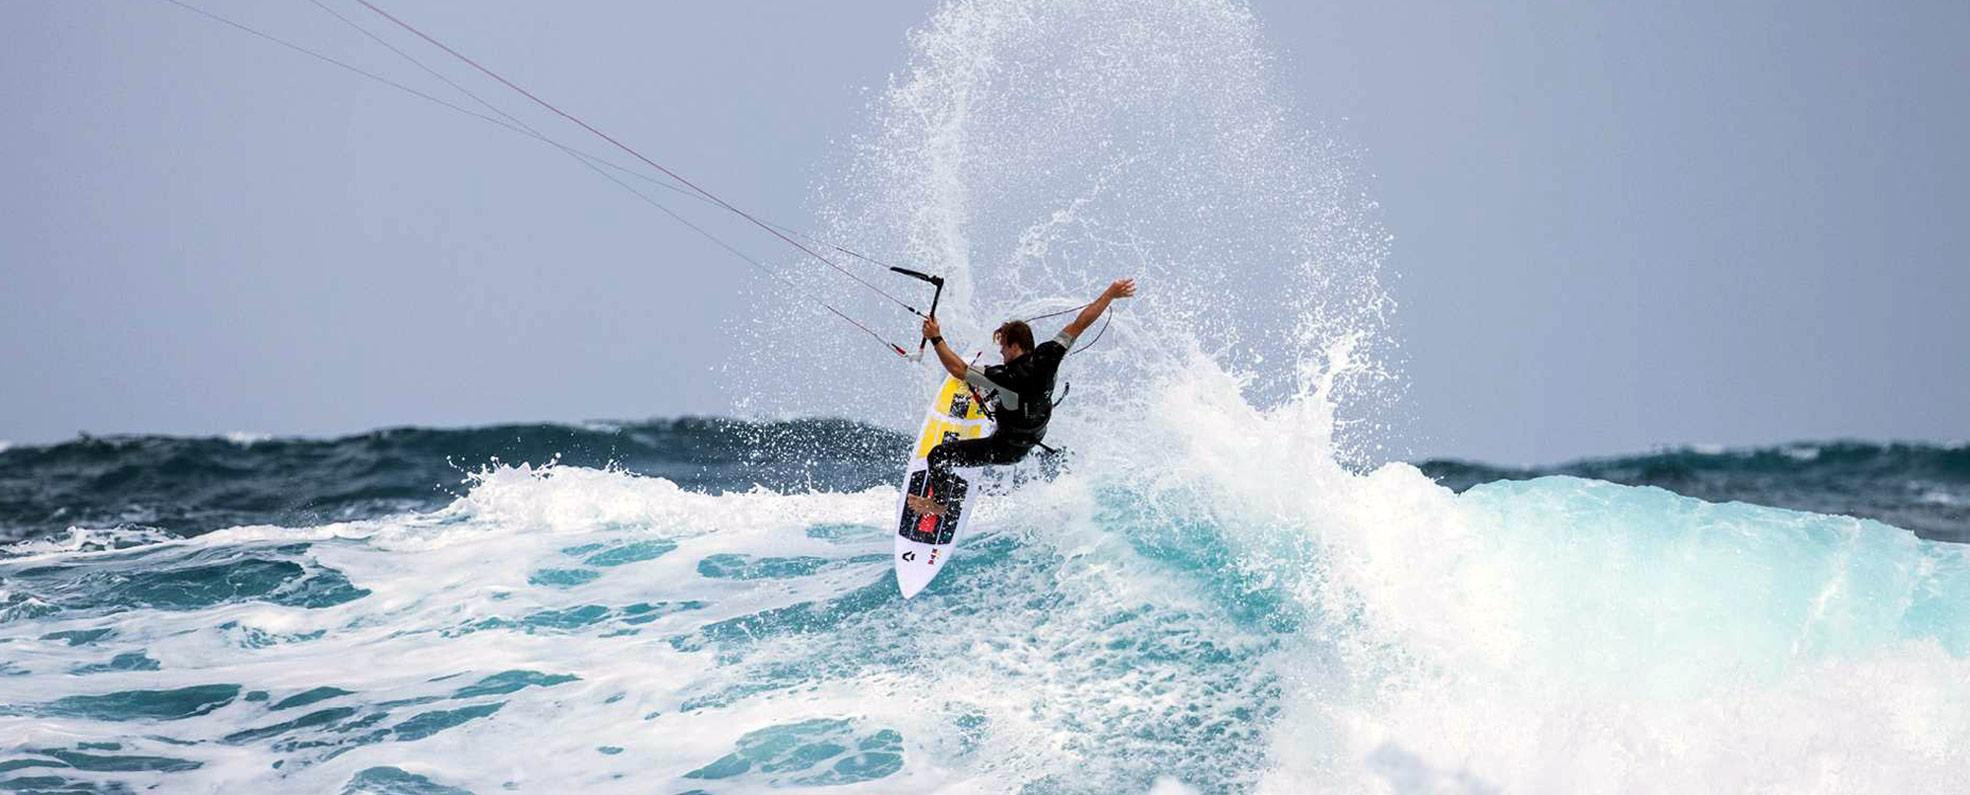 wam_neo-surskite-d-lab-wam-fish-whip-dlab-2022-Duotone-Kiteboarding